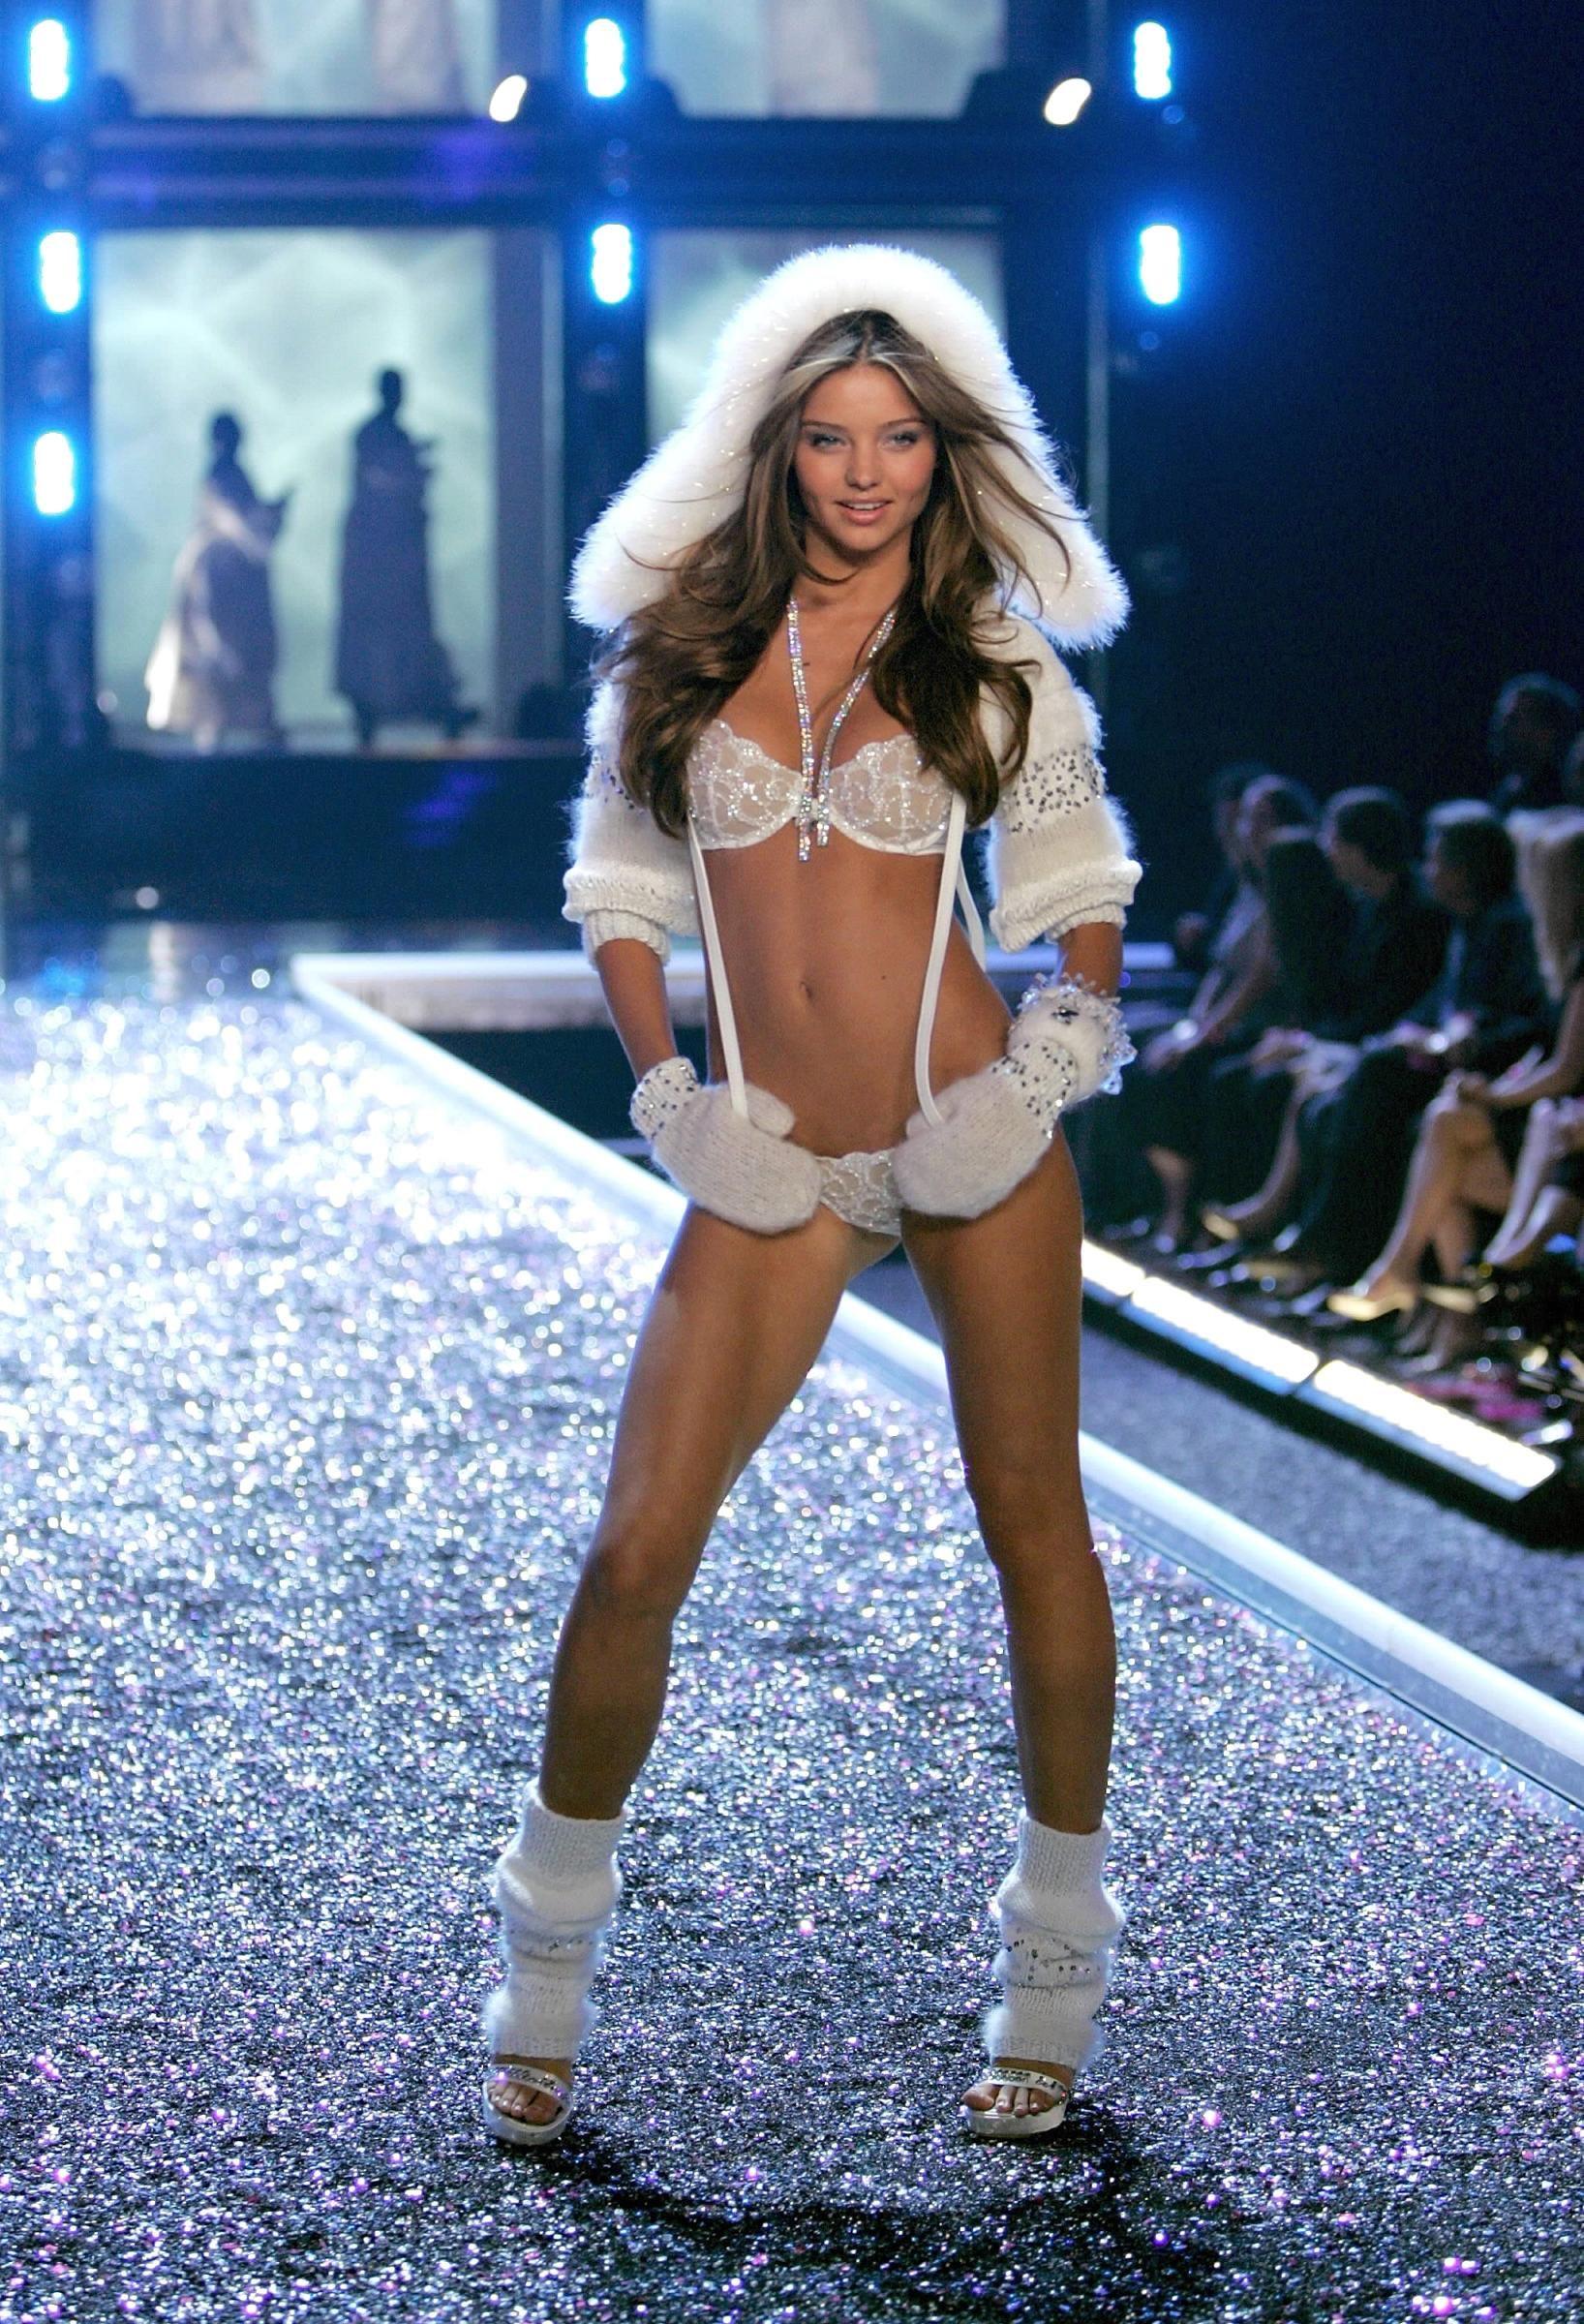 c1a062bd509 Miranda Kerr -- Victoria s Secret Fashion Show 2006 --